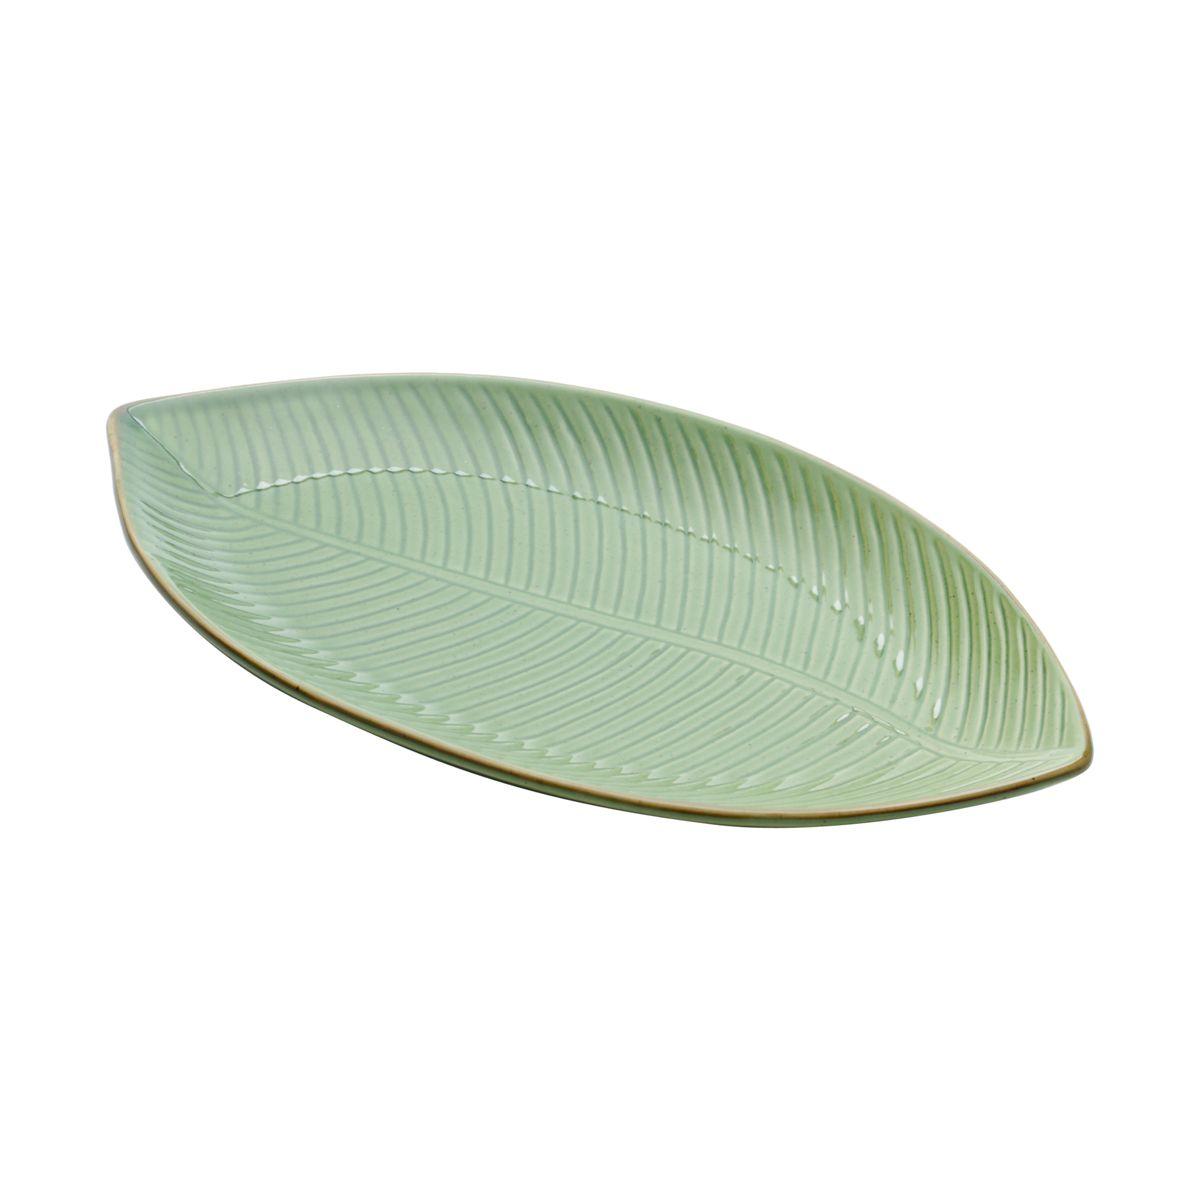 Prato decorativo 34 x 18 cm de cerâmica verde Banana Leaf Lyor - L4128